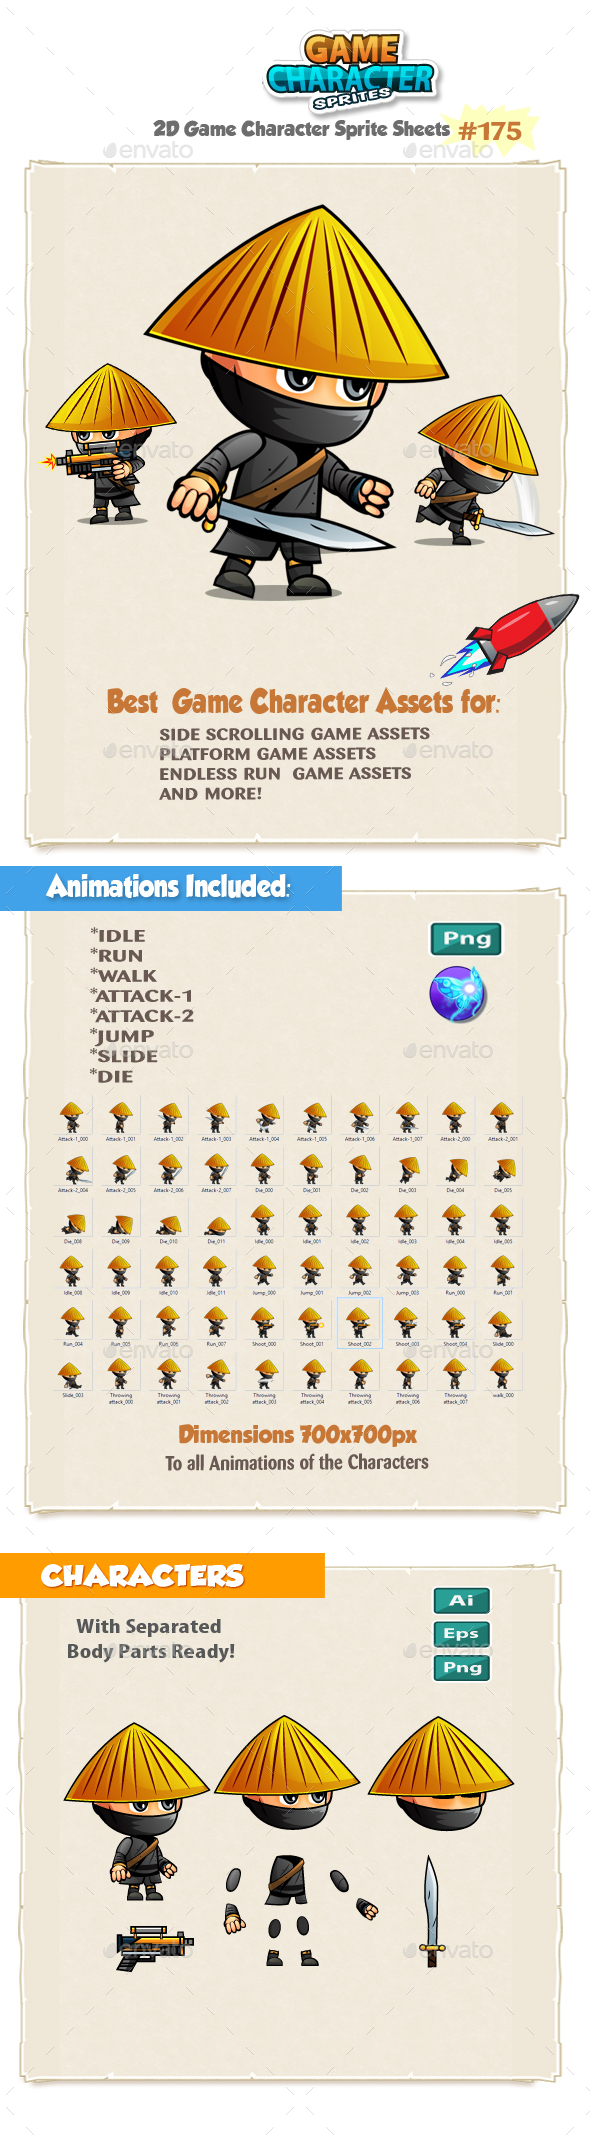 Samurai 2D Game Character Sprites 175. - Sprites Game Assets